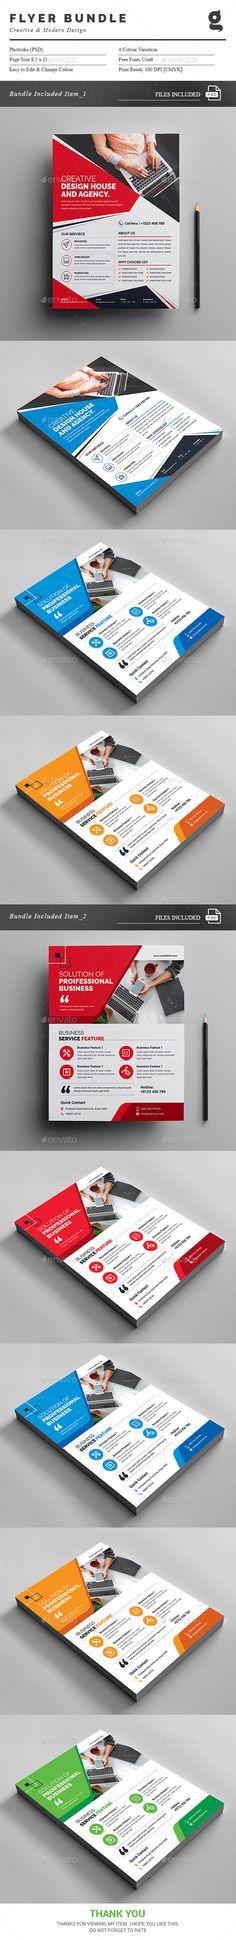 Flyer Templates PSD Bundle. Download here: https://graphicriver.net/item/flyer-bundle-2-in-1/17144645?ref=ksioks